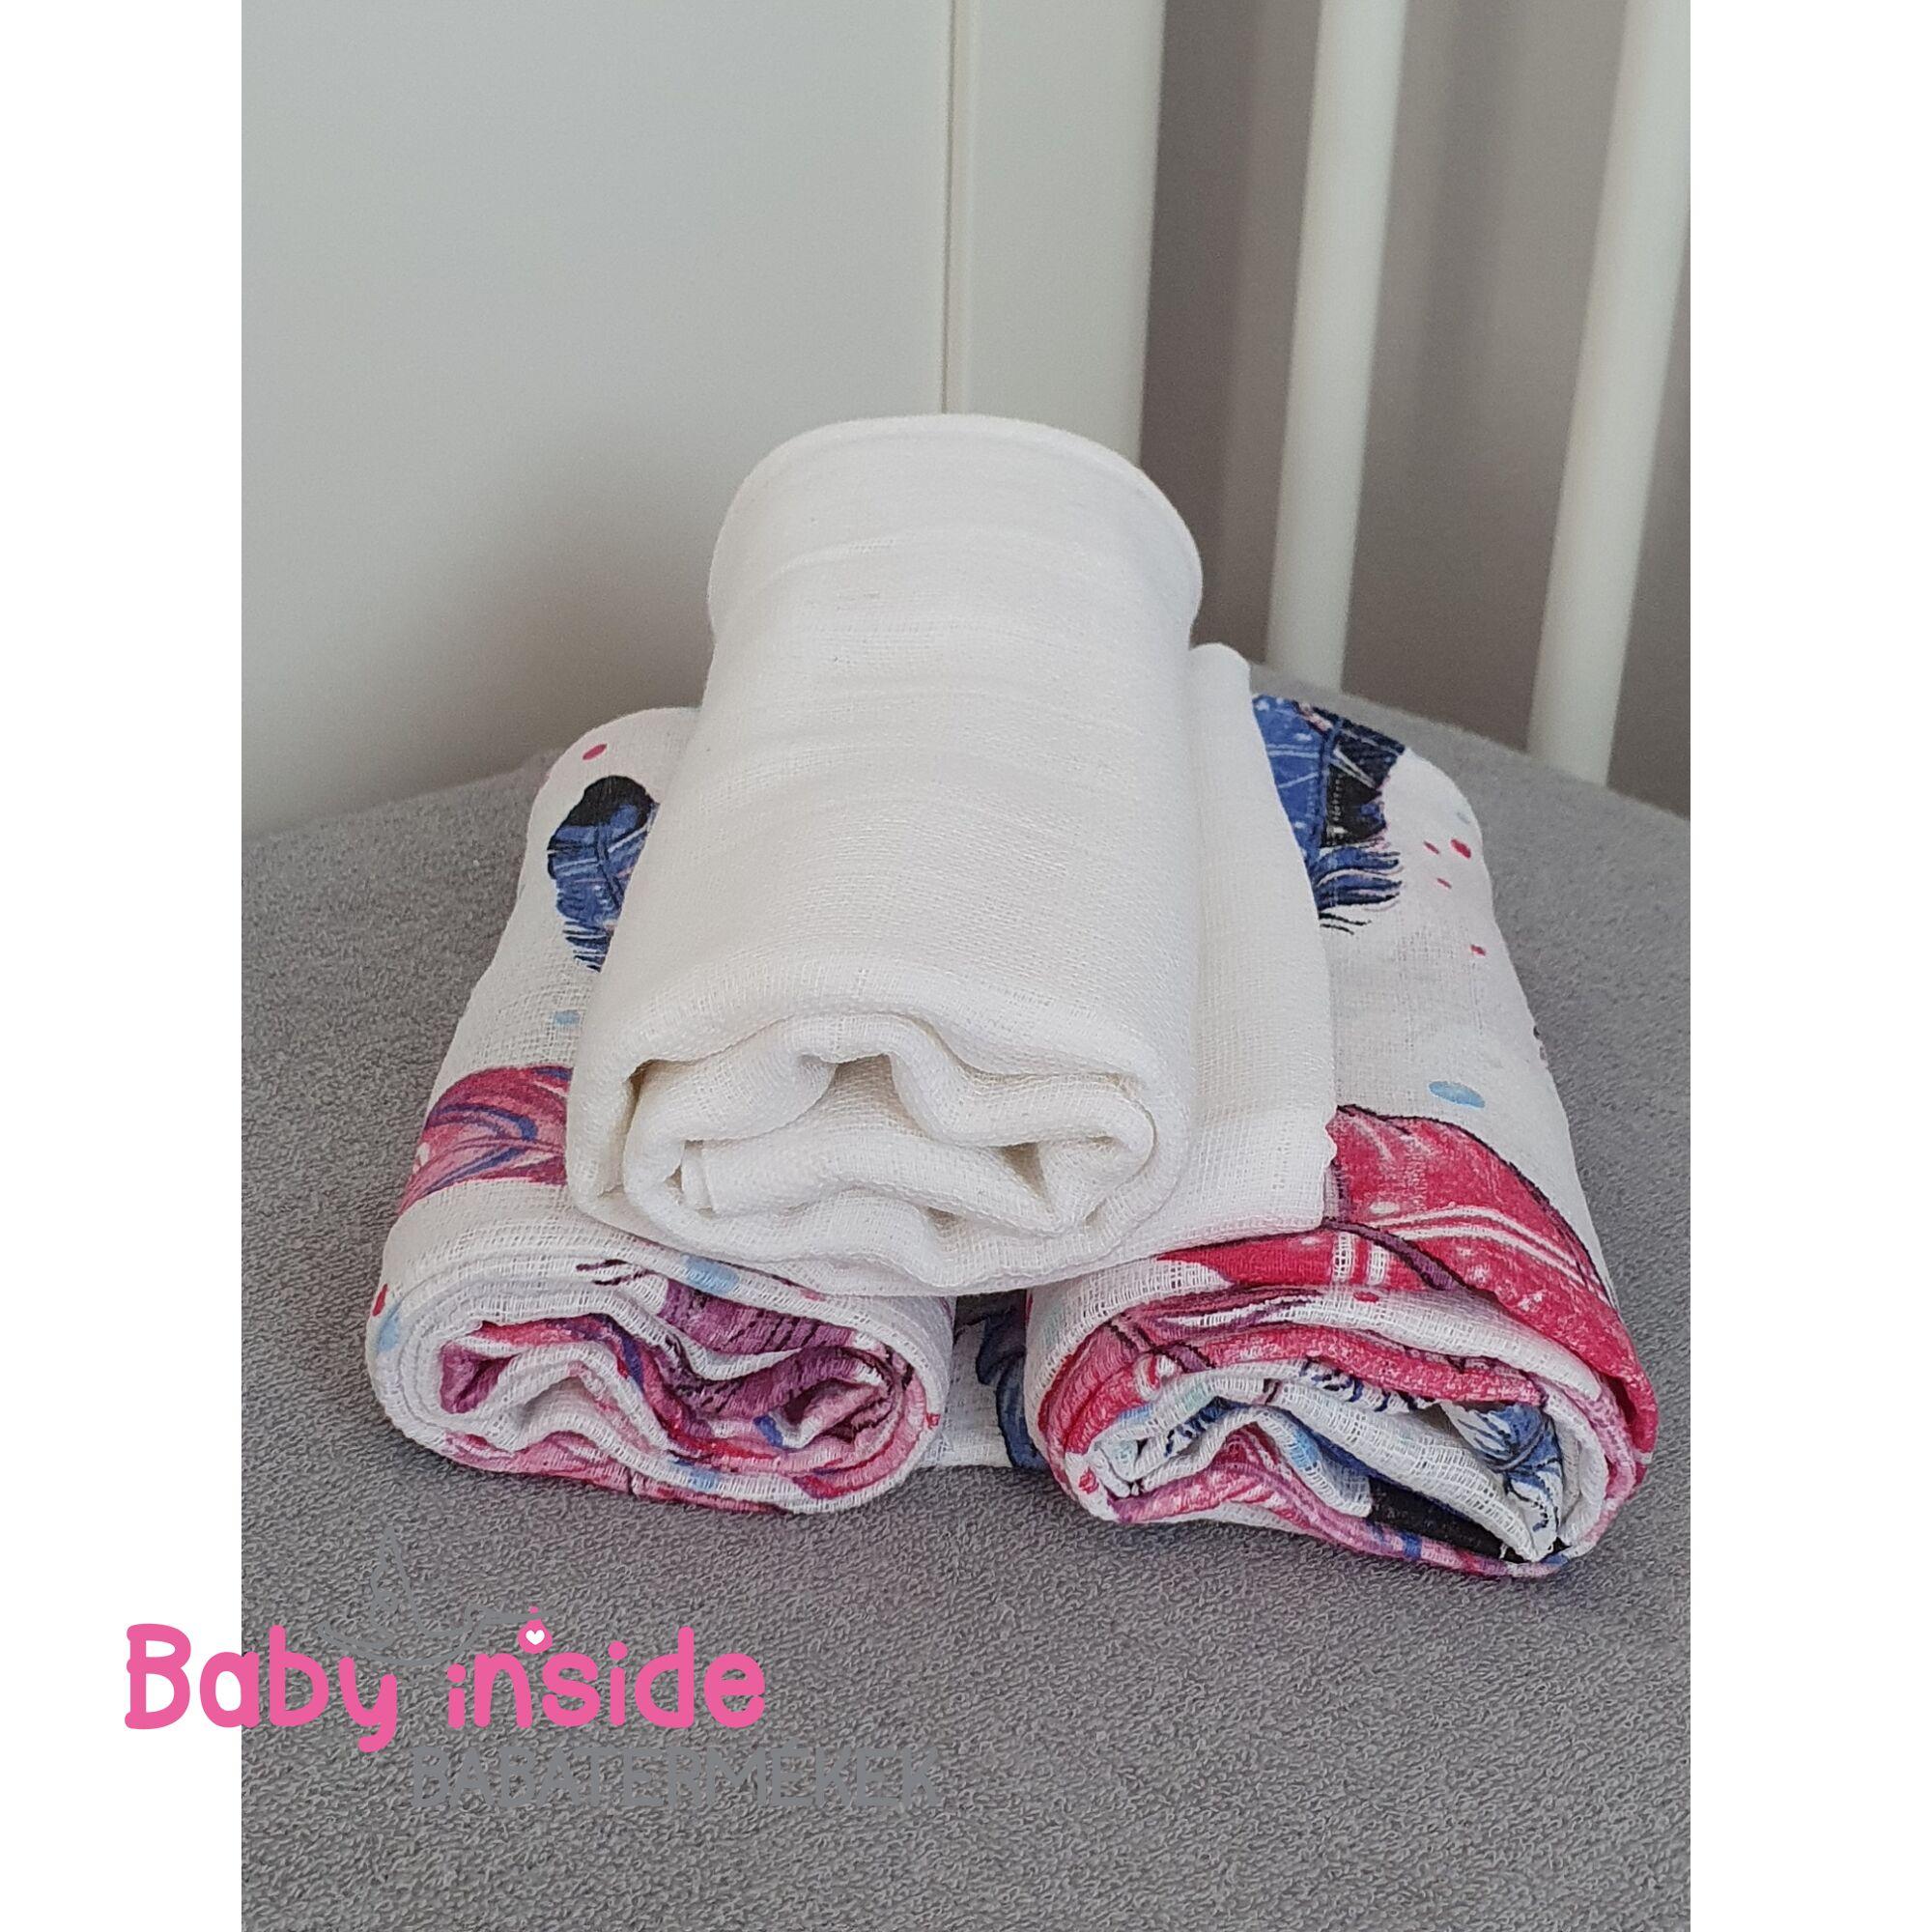 textilpelenka, textilpelus